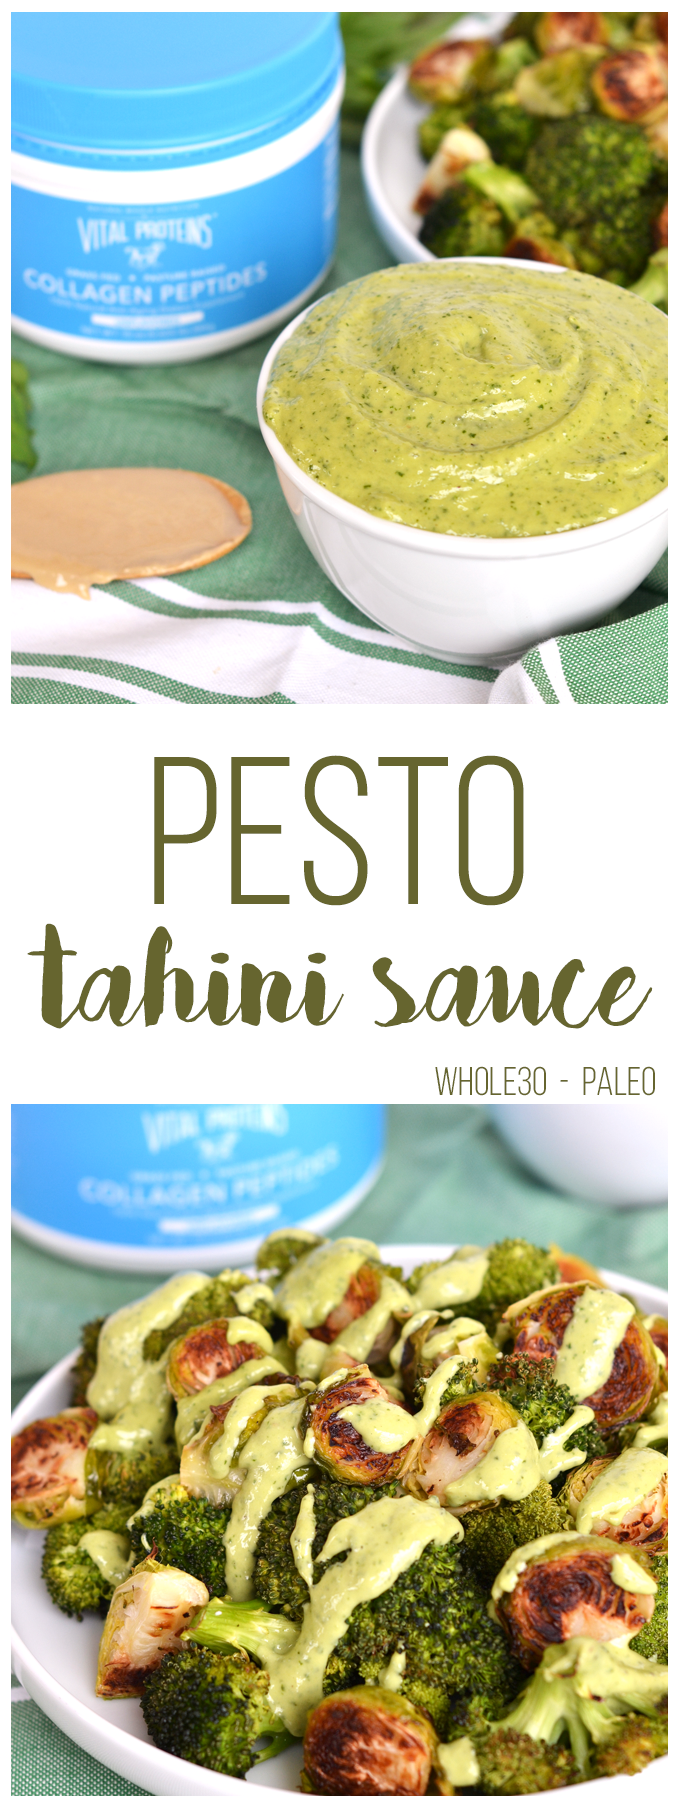 This Pesto Tahini Sauce Is Whole30 Paleo Perfect To Top On Veggies Meat